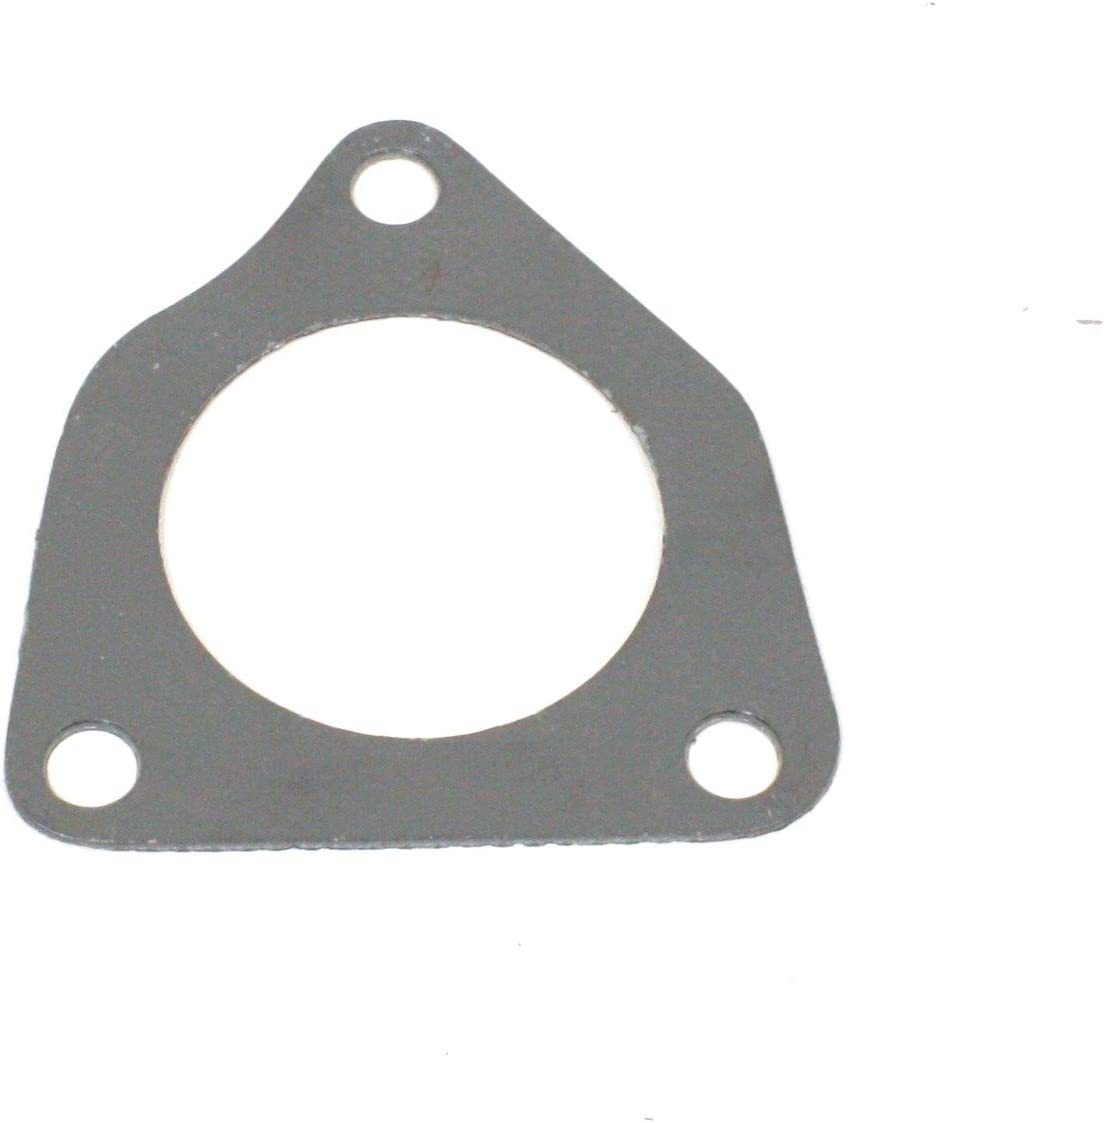 JBA 063-1683 Cat Gasket for Ford Focus Zetec